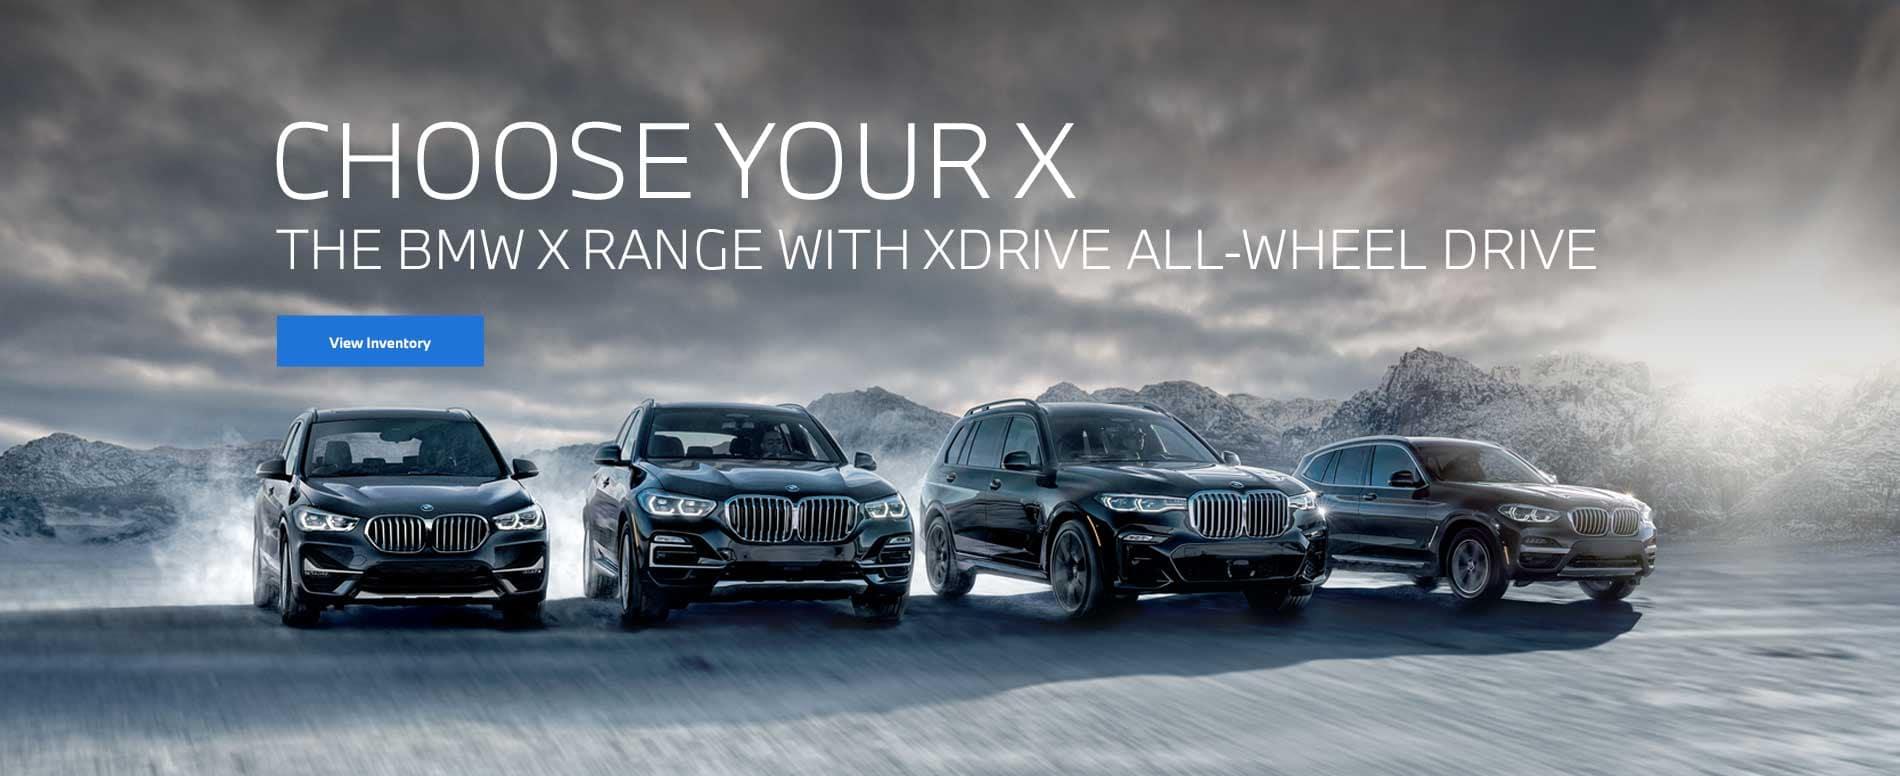 2021 BMW XDRIVE ALL-WHEEL DRIVE